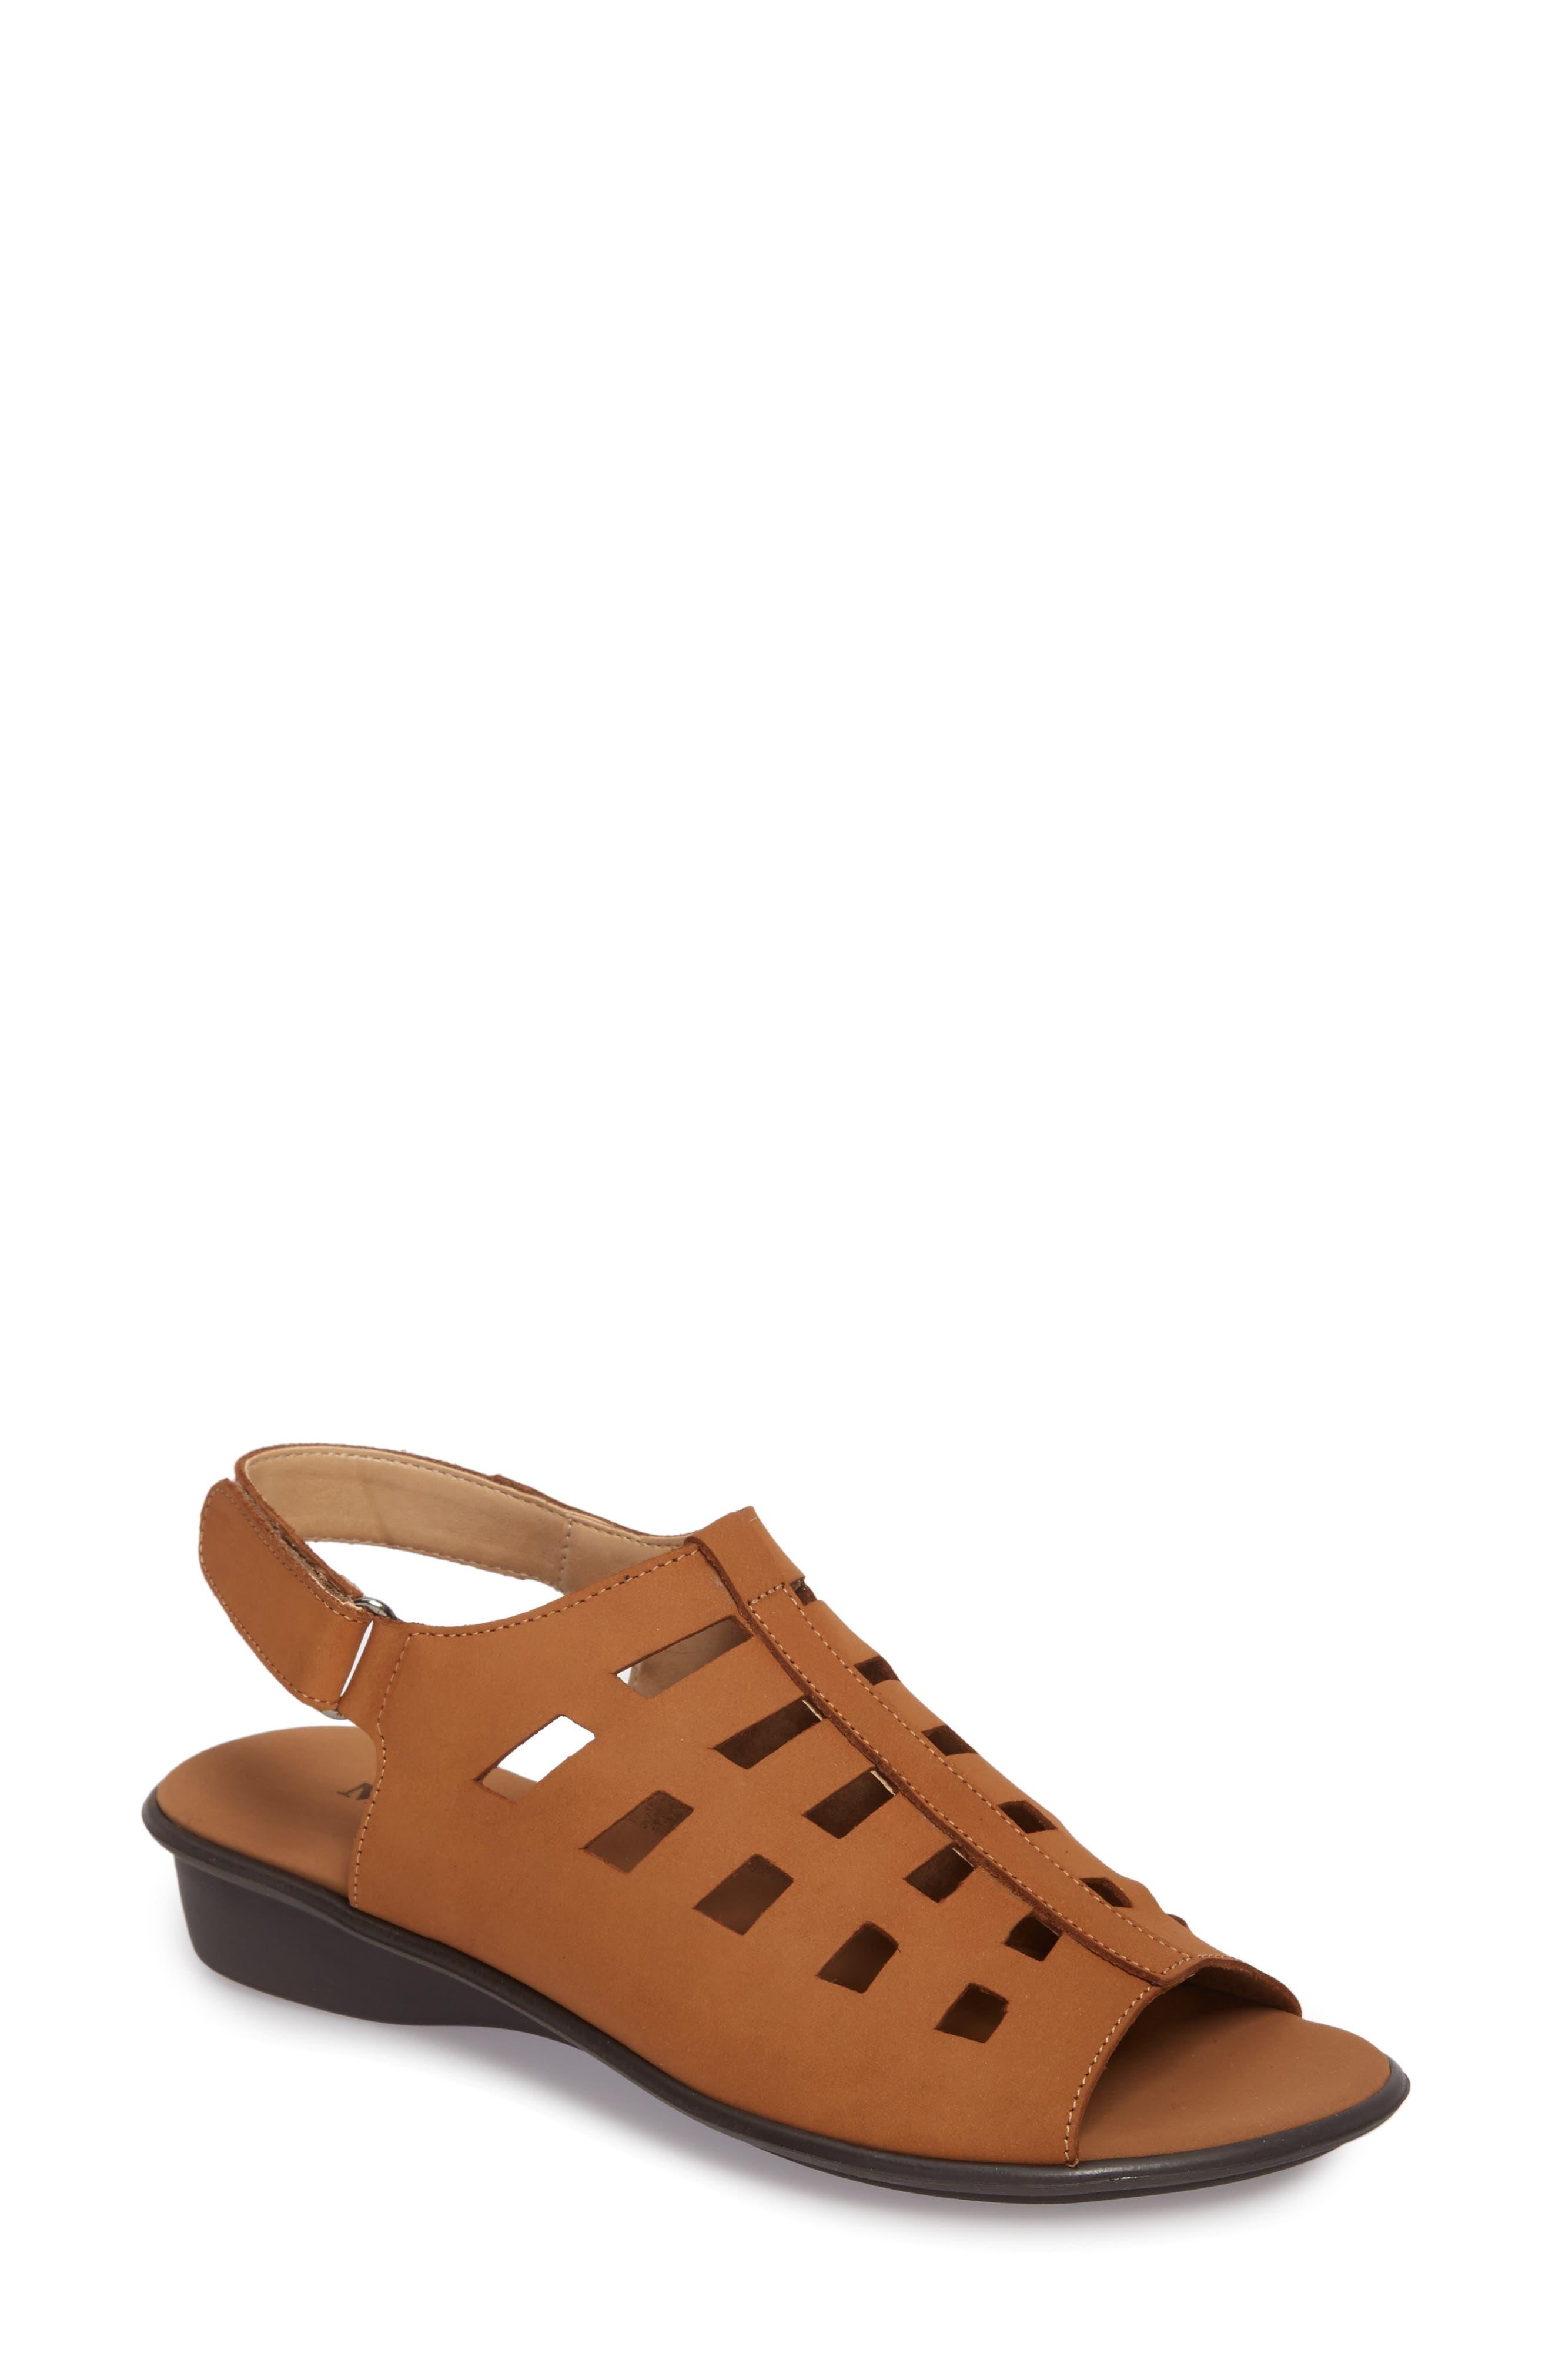 Elita Cutout Slingback Sandal,                         Main,                         color, Viso Nubuck